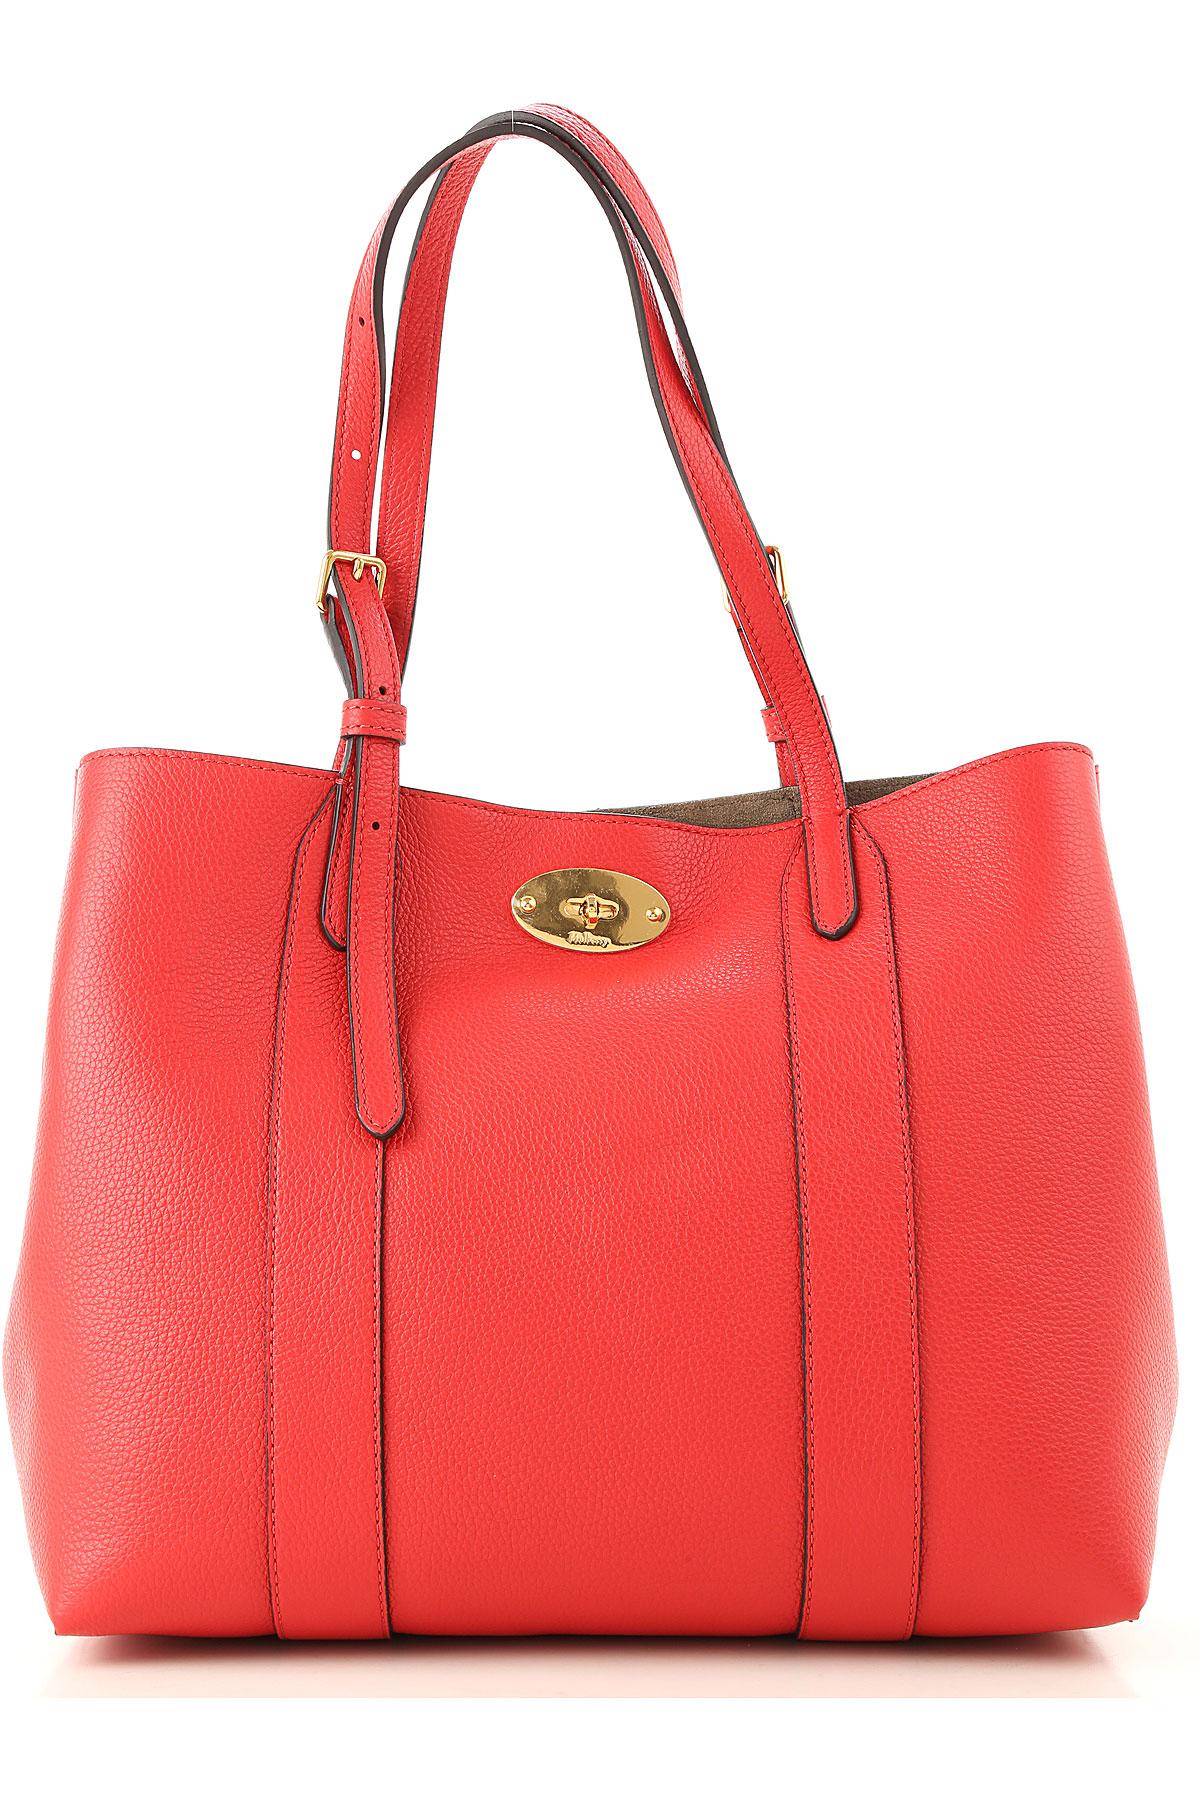 364a3d1899 Mulberry Shoulder Bag for Women